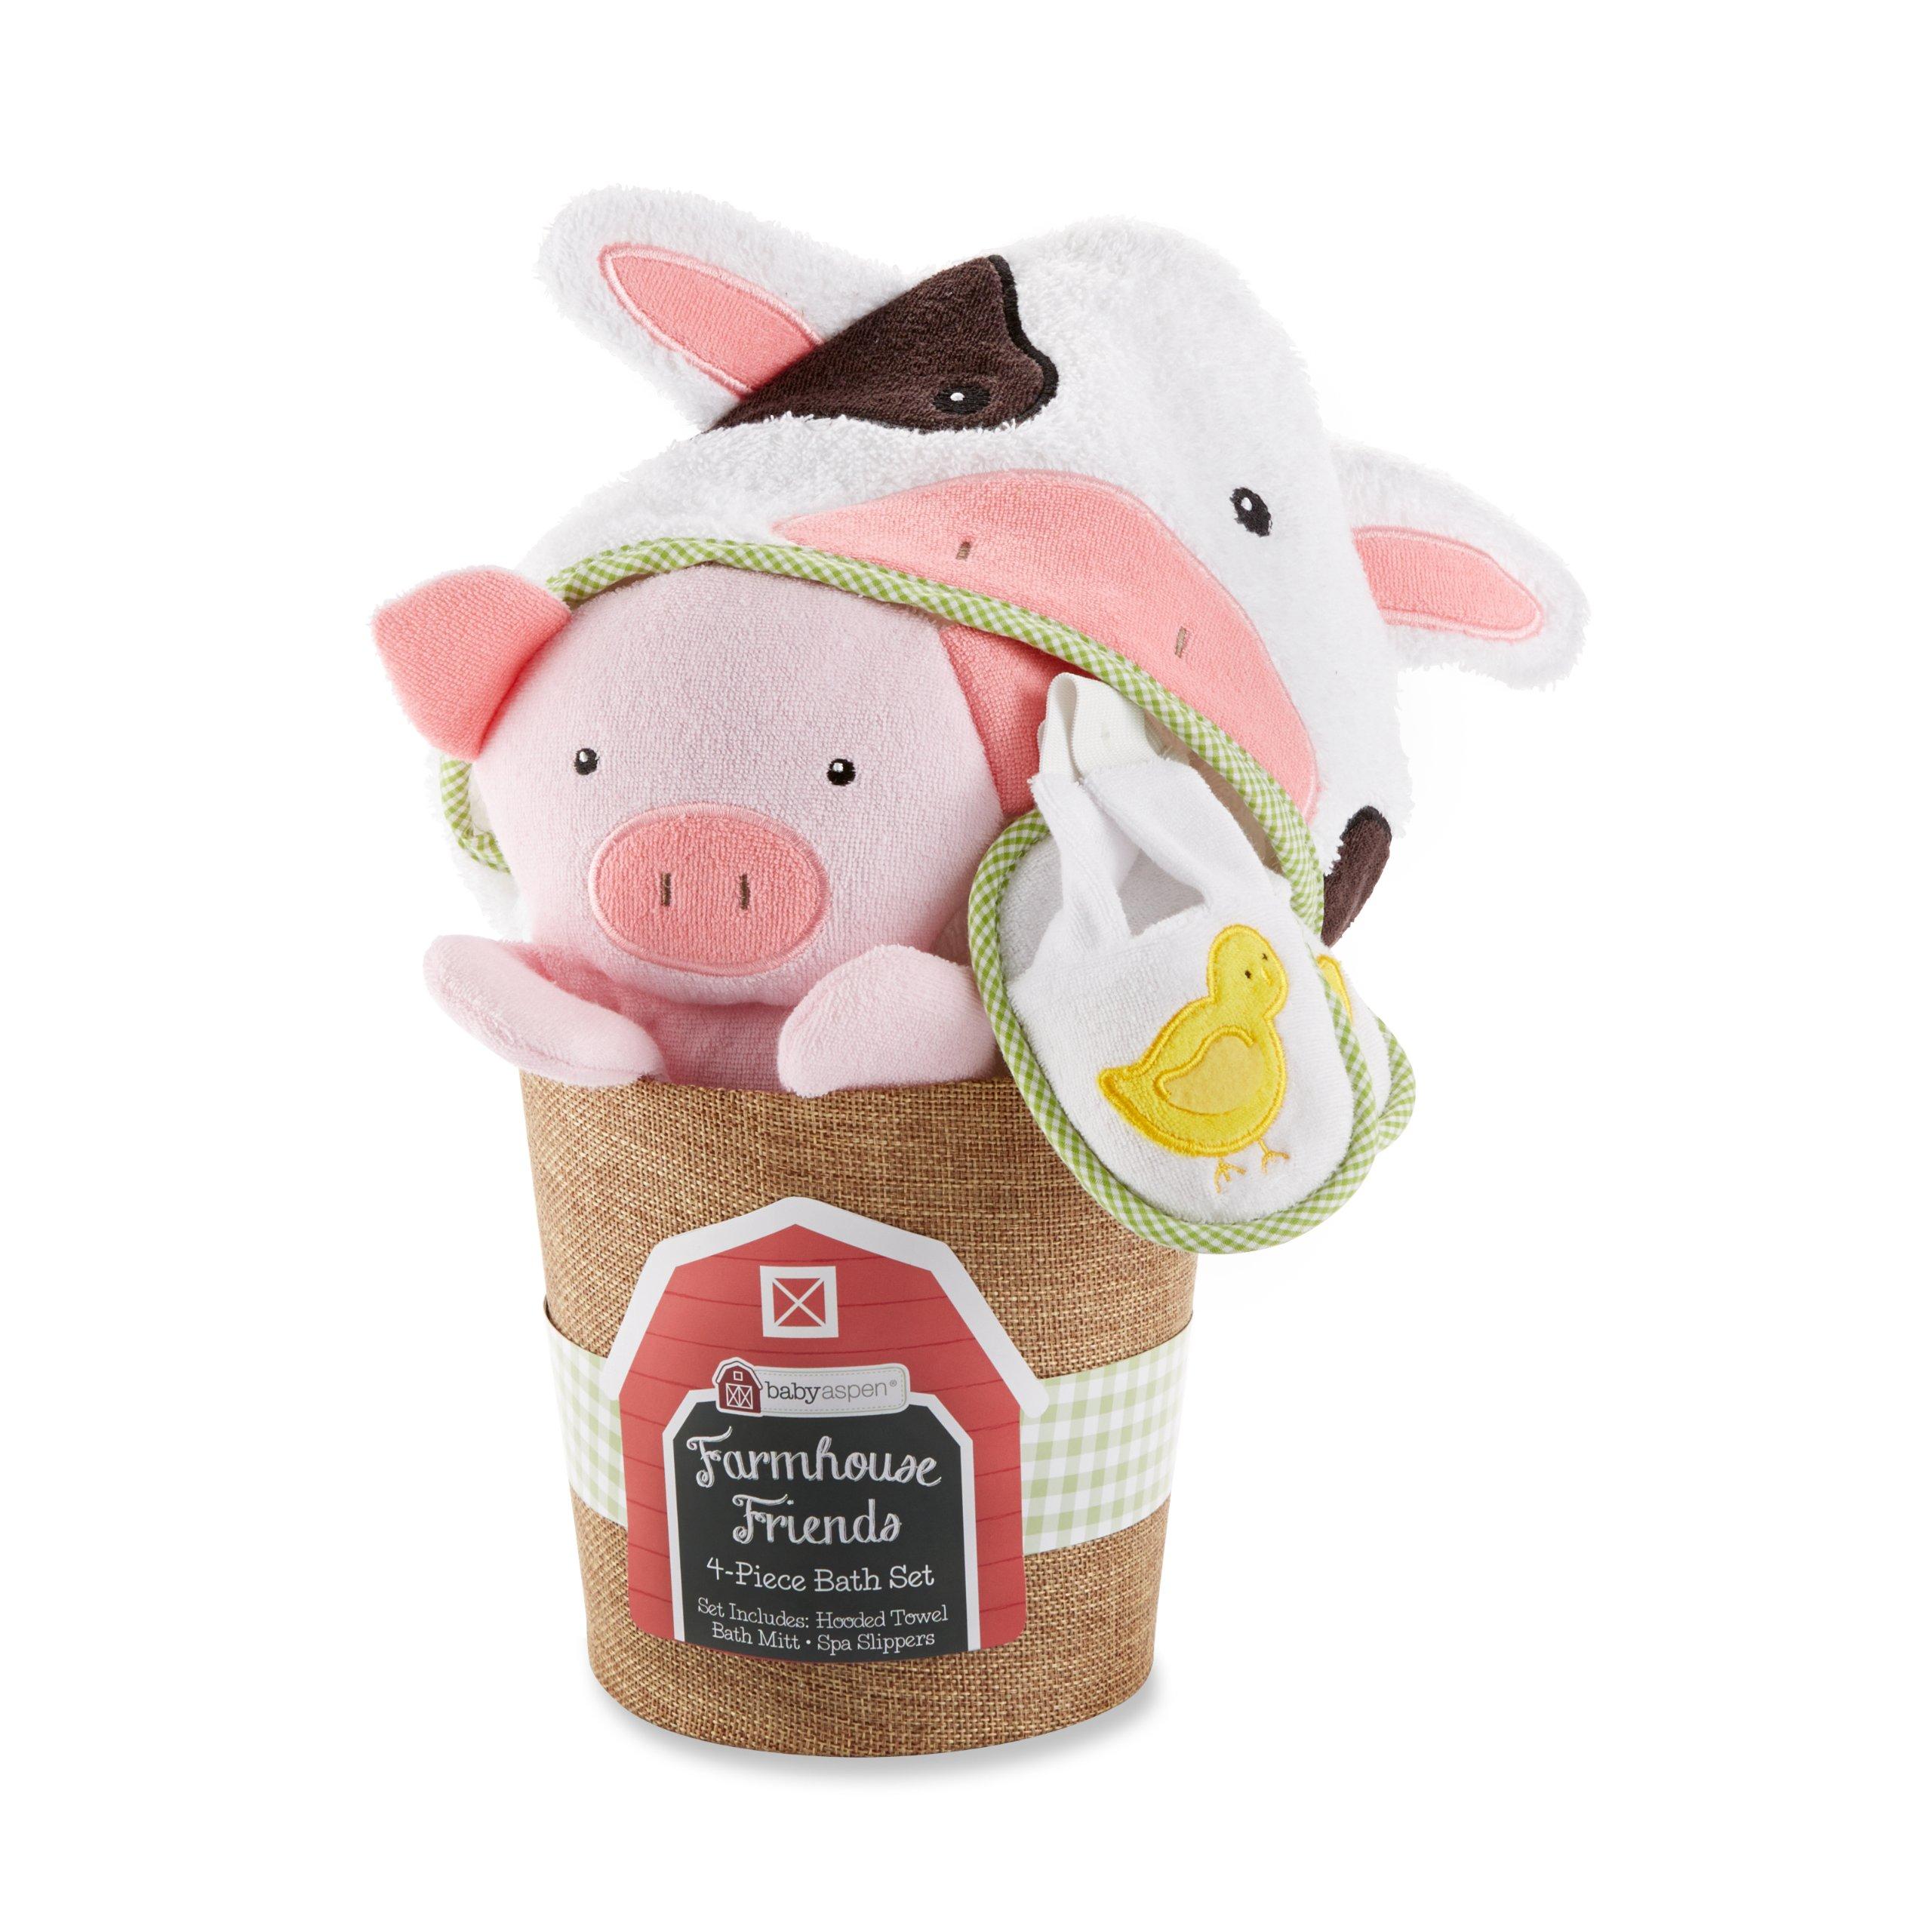 Baby Aspen, Farmhouse Friends 4-Piece Bathtime Bucket, 0-6 Months by Baby Aspen